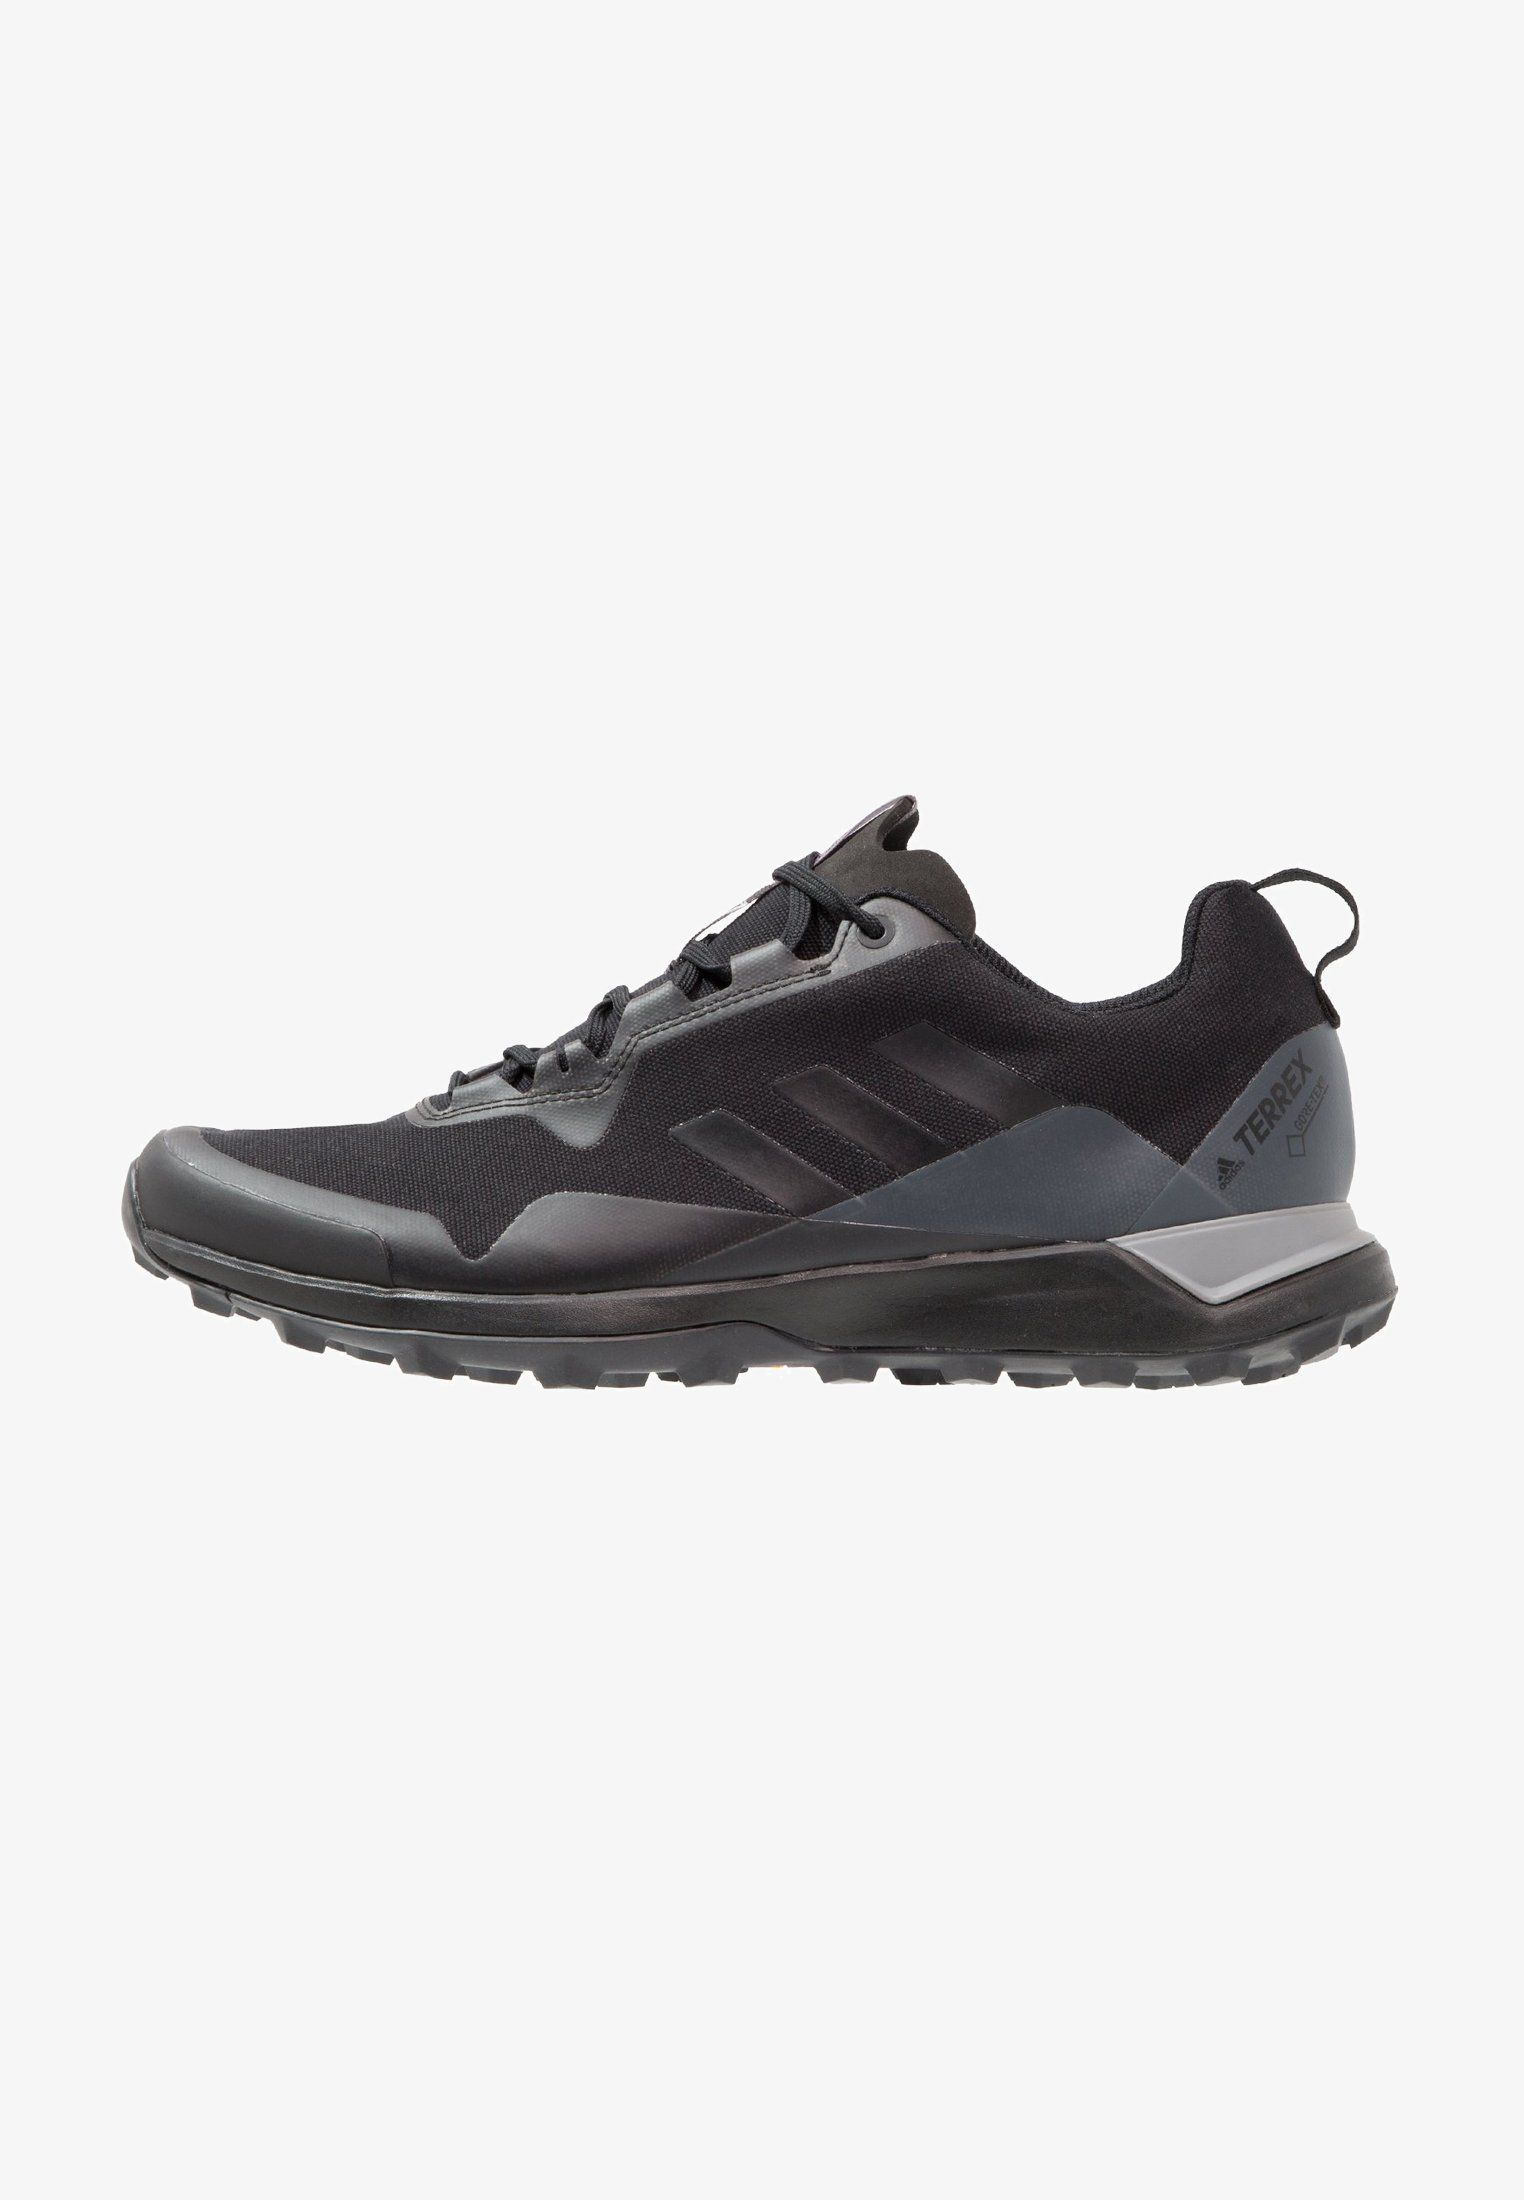 meet 36059 8f904 adidas Performance TERREX CMTK GTX - Hikingschuh - core black grey three -  Zalando.at